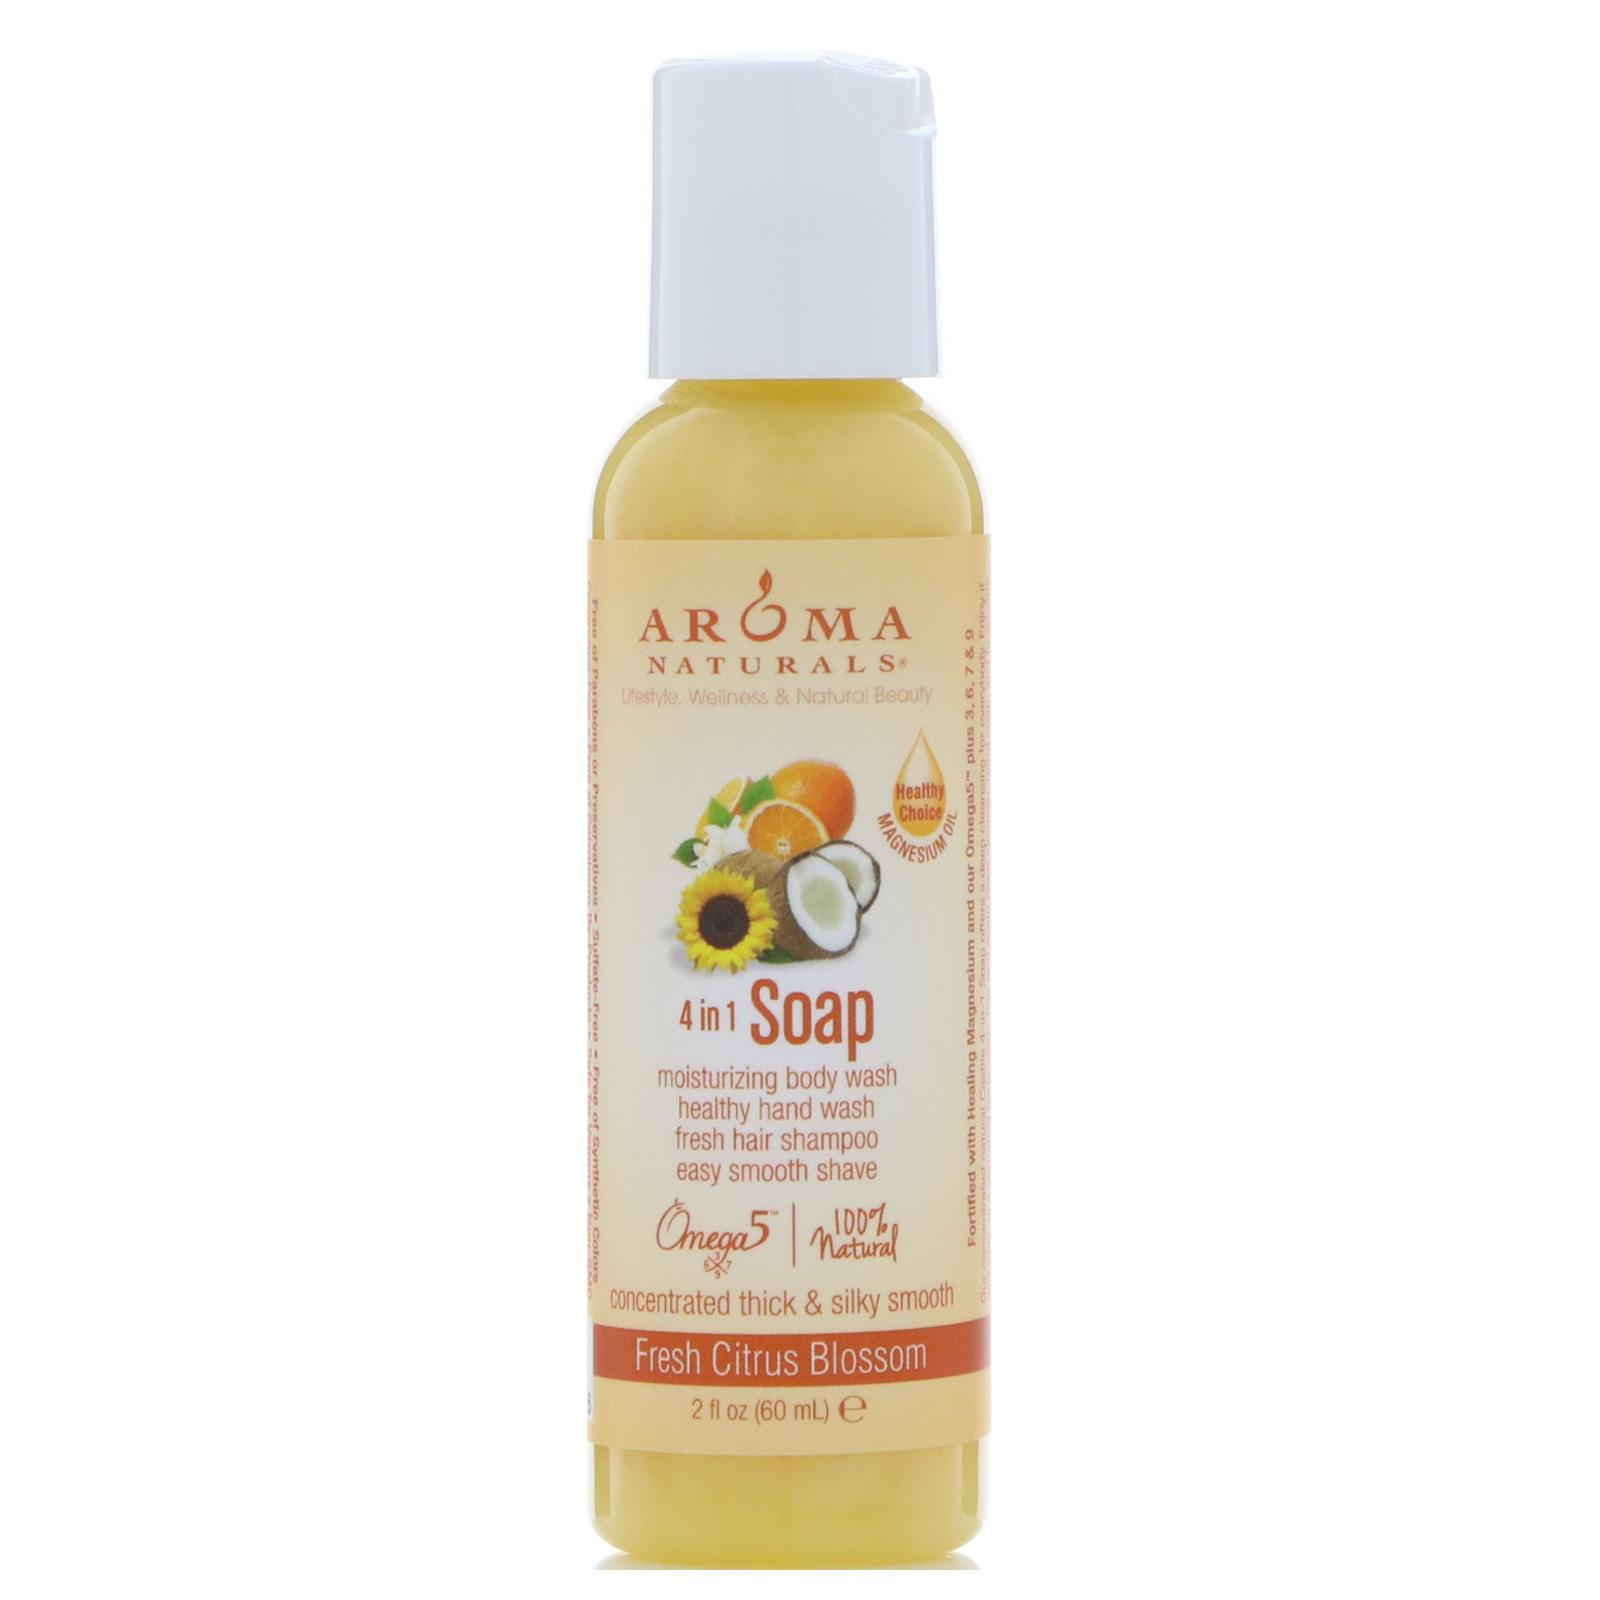 Aroma Naturals, 4 in 1 Soap, Fresh Citrus Blossom, 2 fl oz (60 ml)